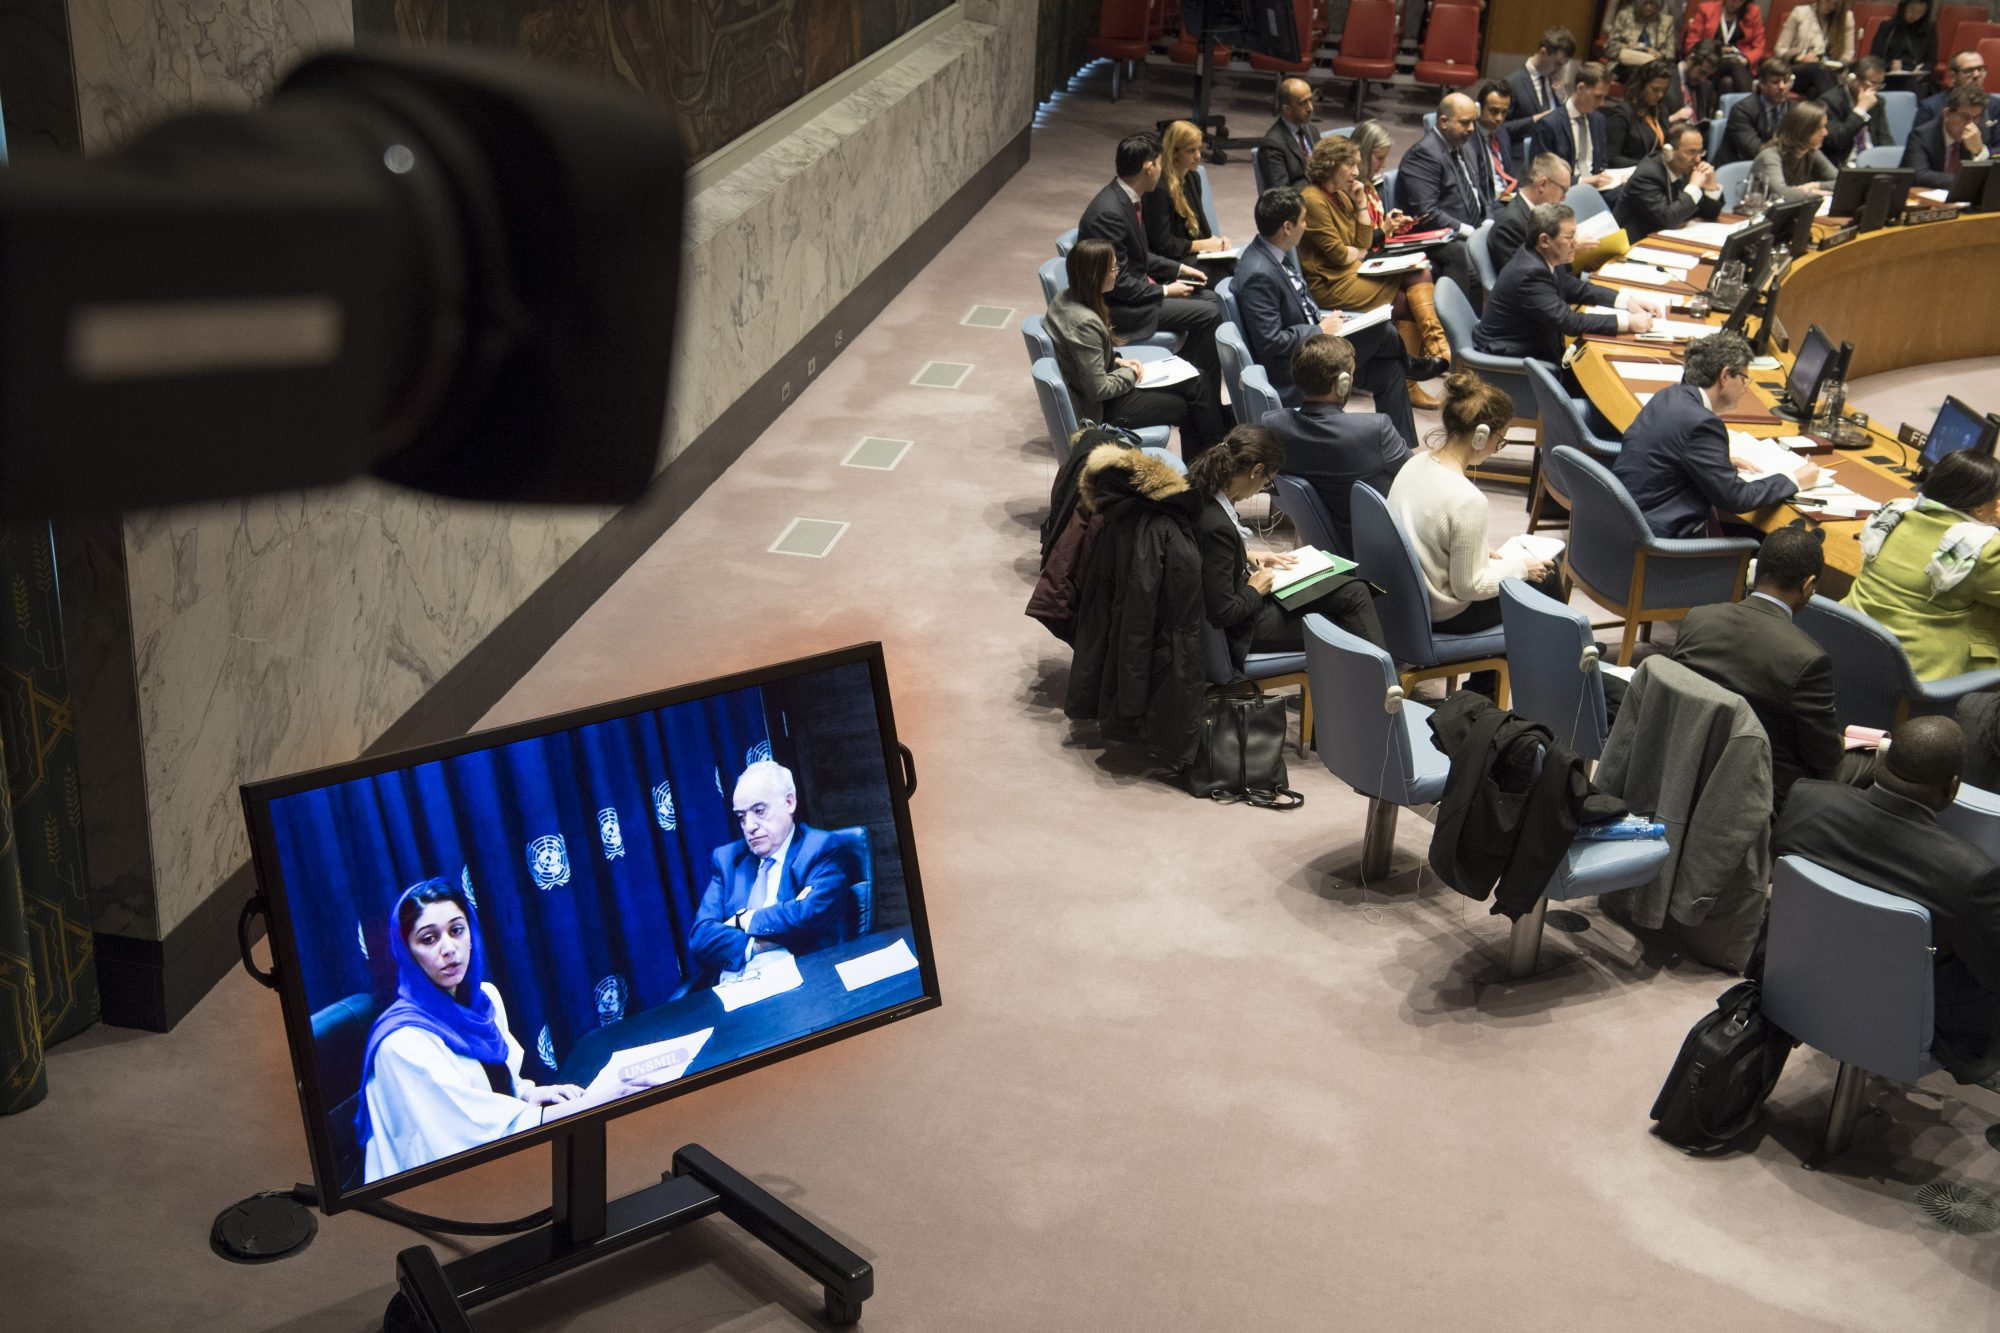 UN Security Council Briefing on Libya by Hajer Sharief